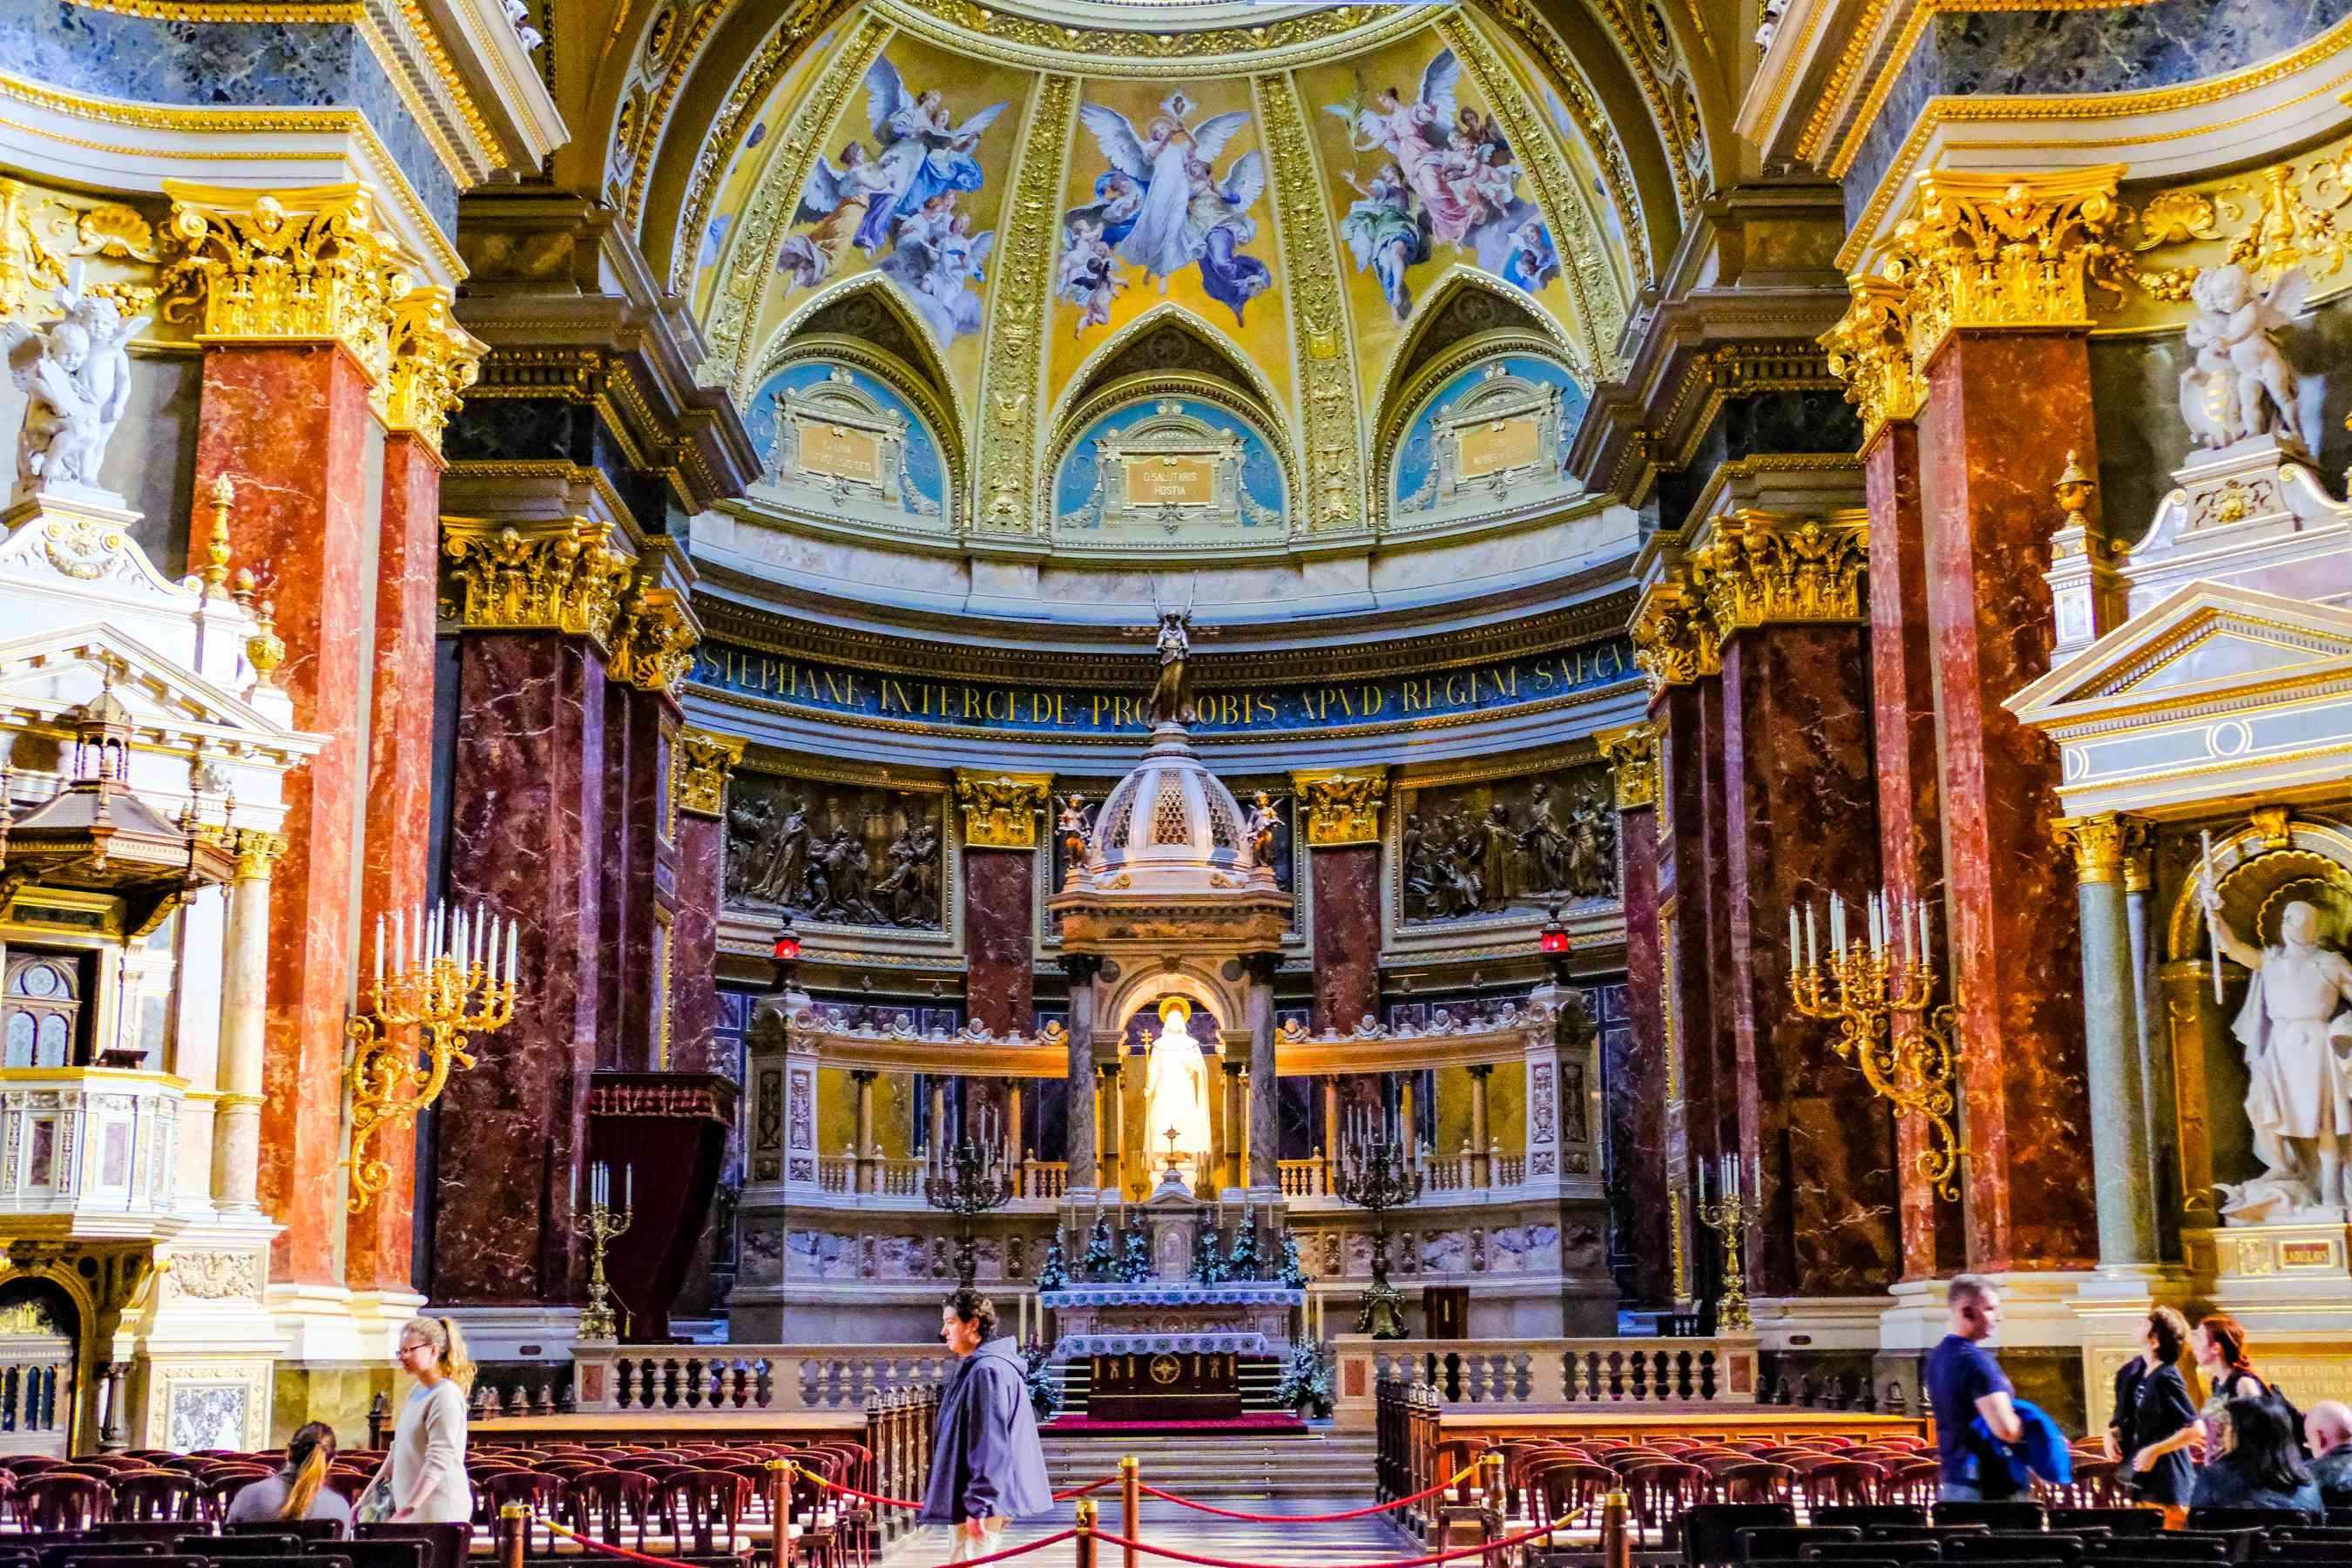 Intricate art work inside St Stephen's Basilica